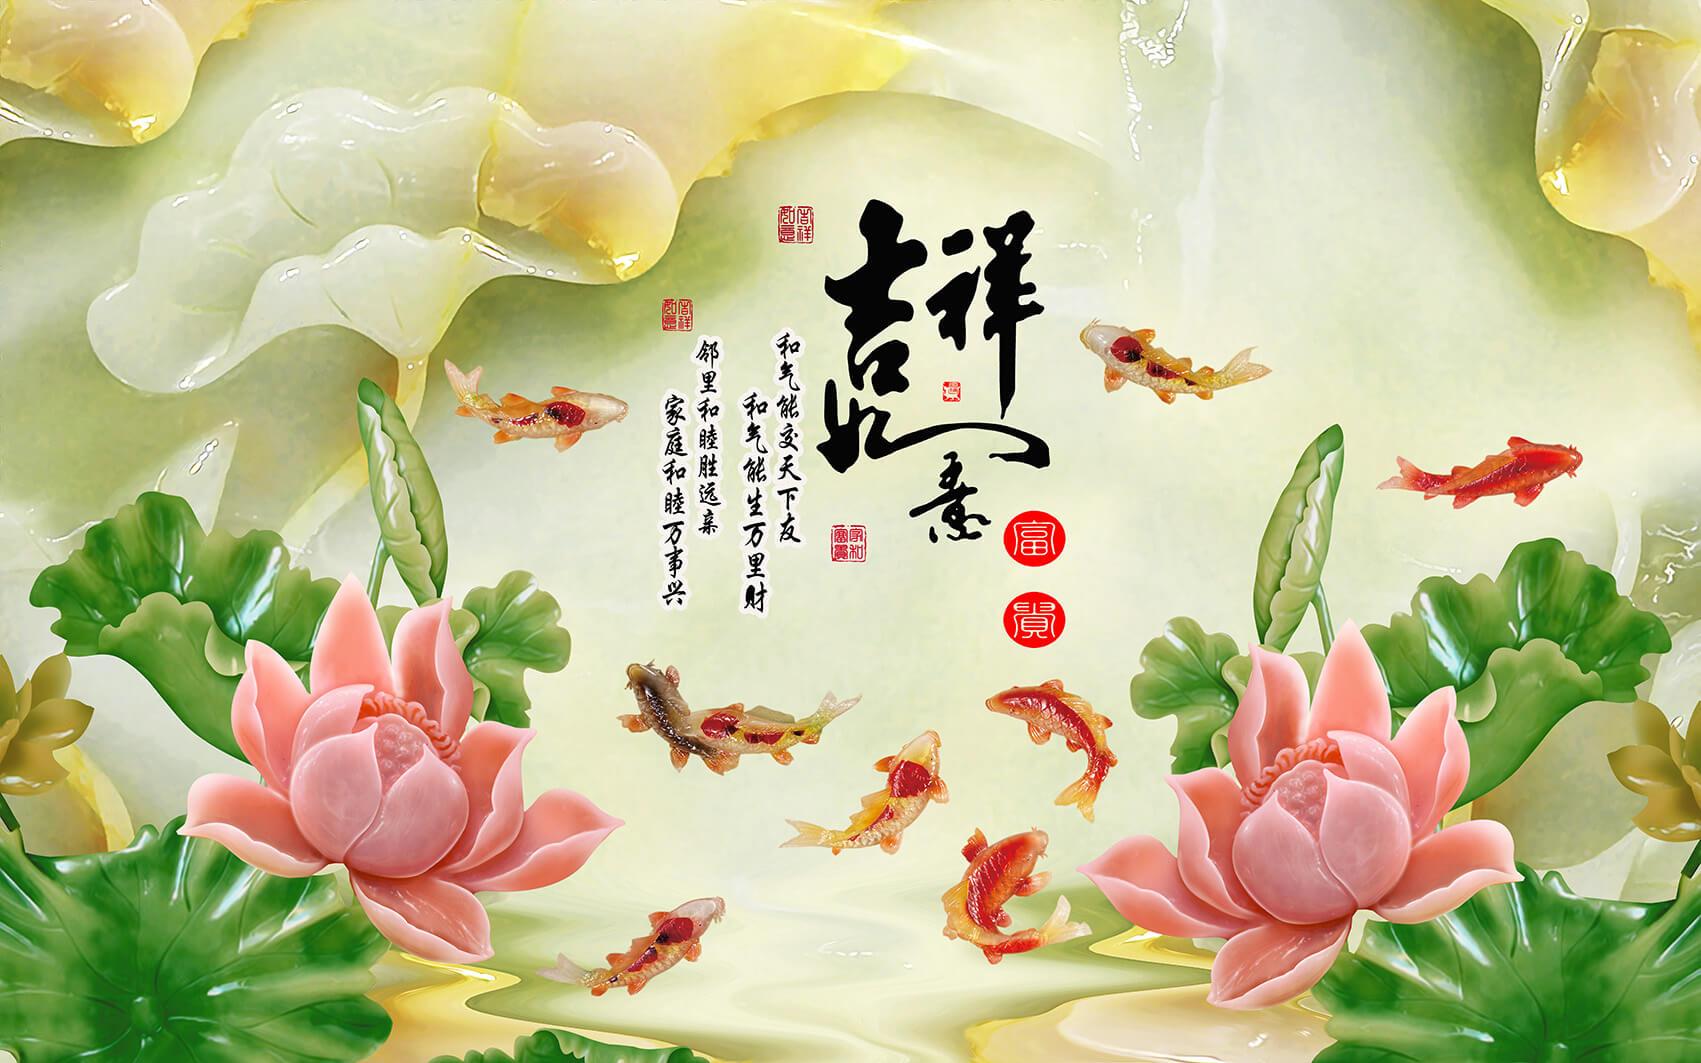 tranh-dan-tuong-gia-ngoc-944